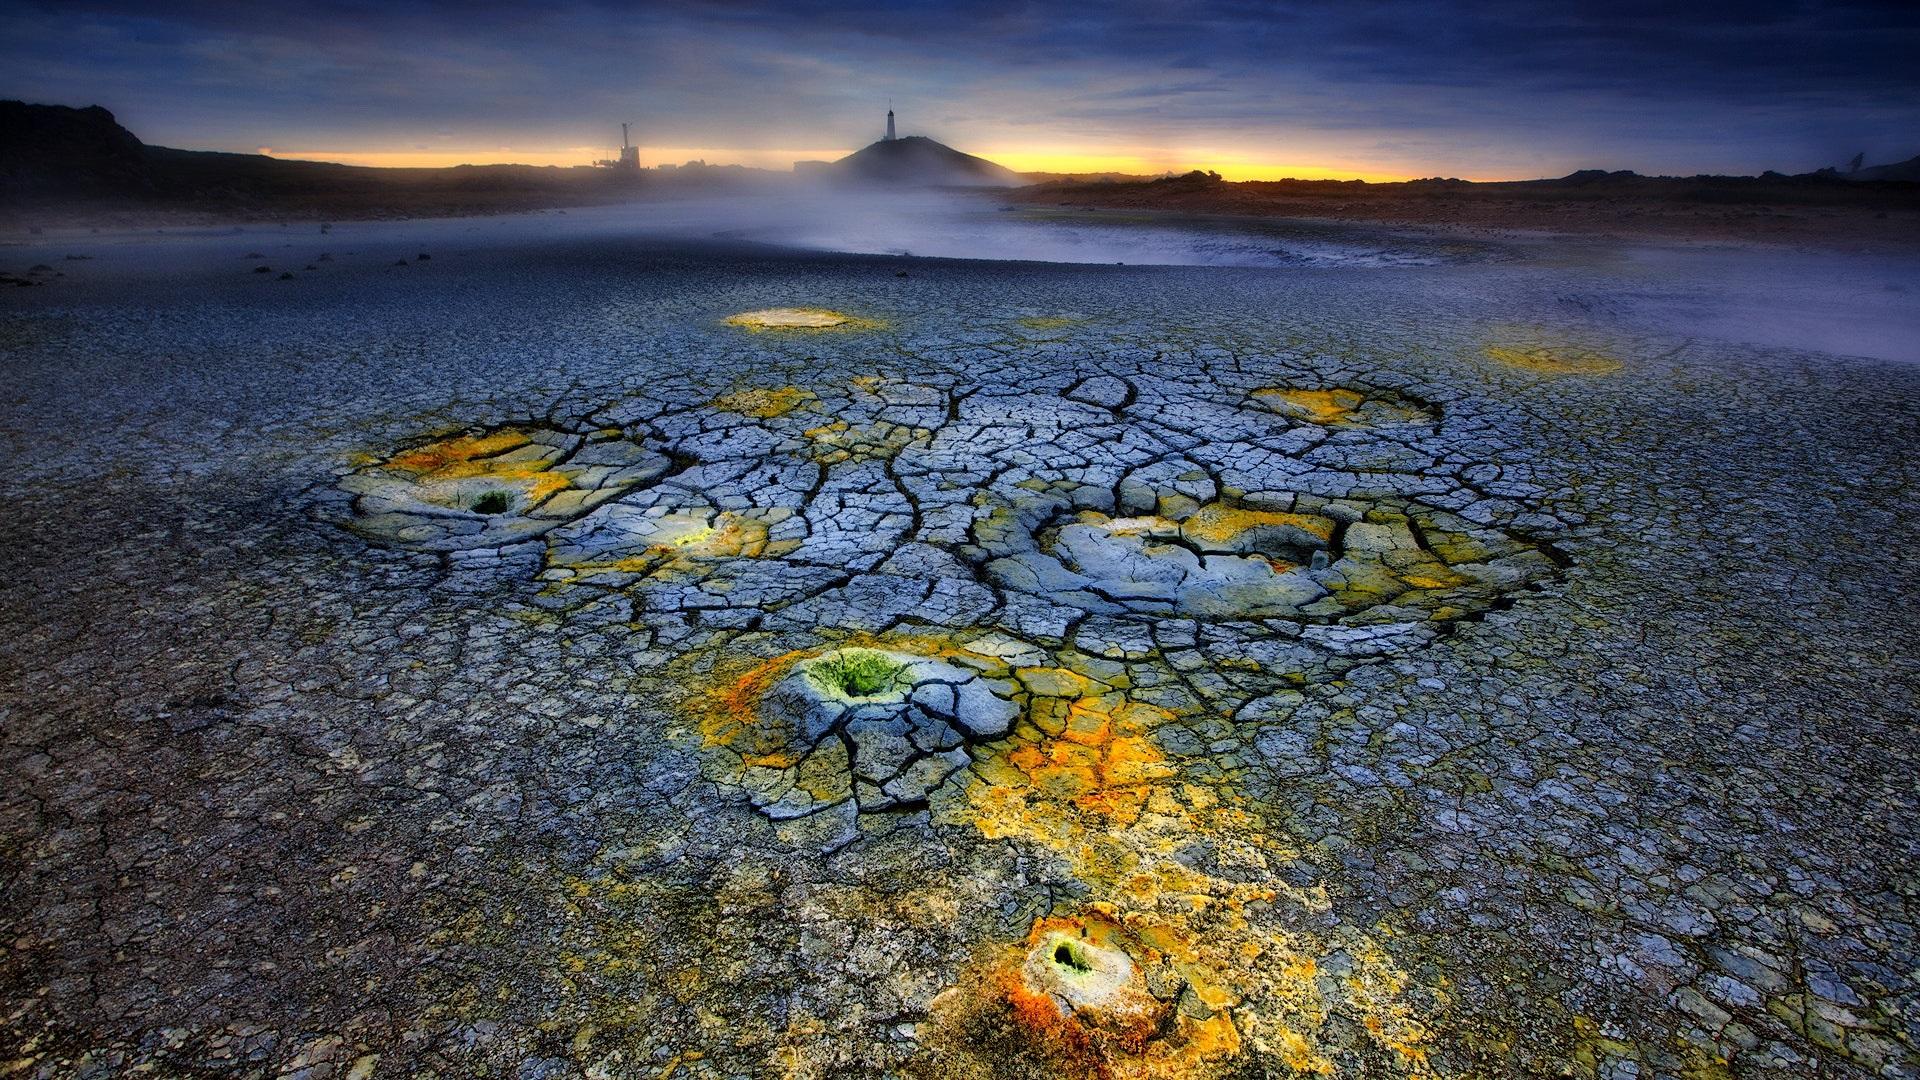 Fondos De Pantalla De Lava: Fondos De Pantalla Volcán, Lava, Crack, Crepúsculo